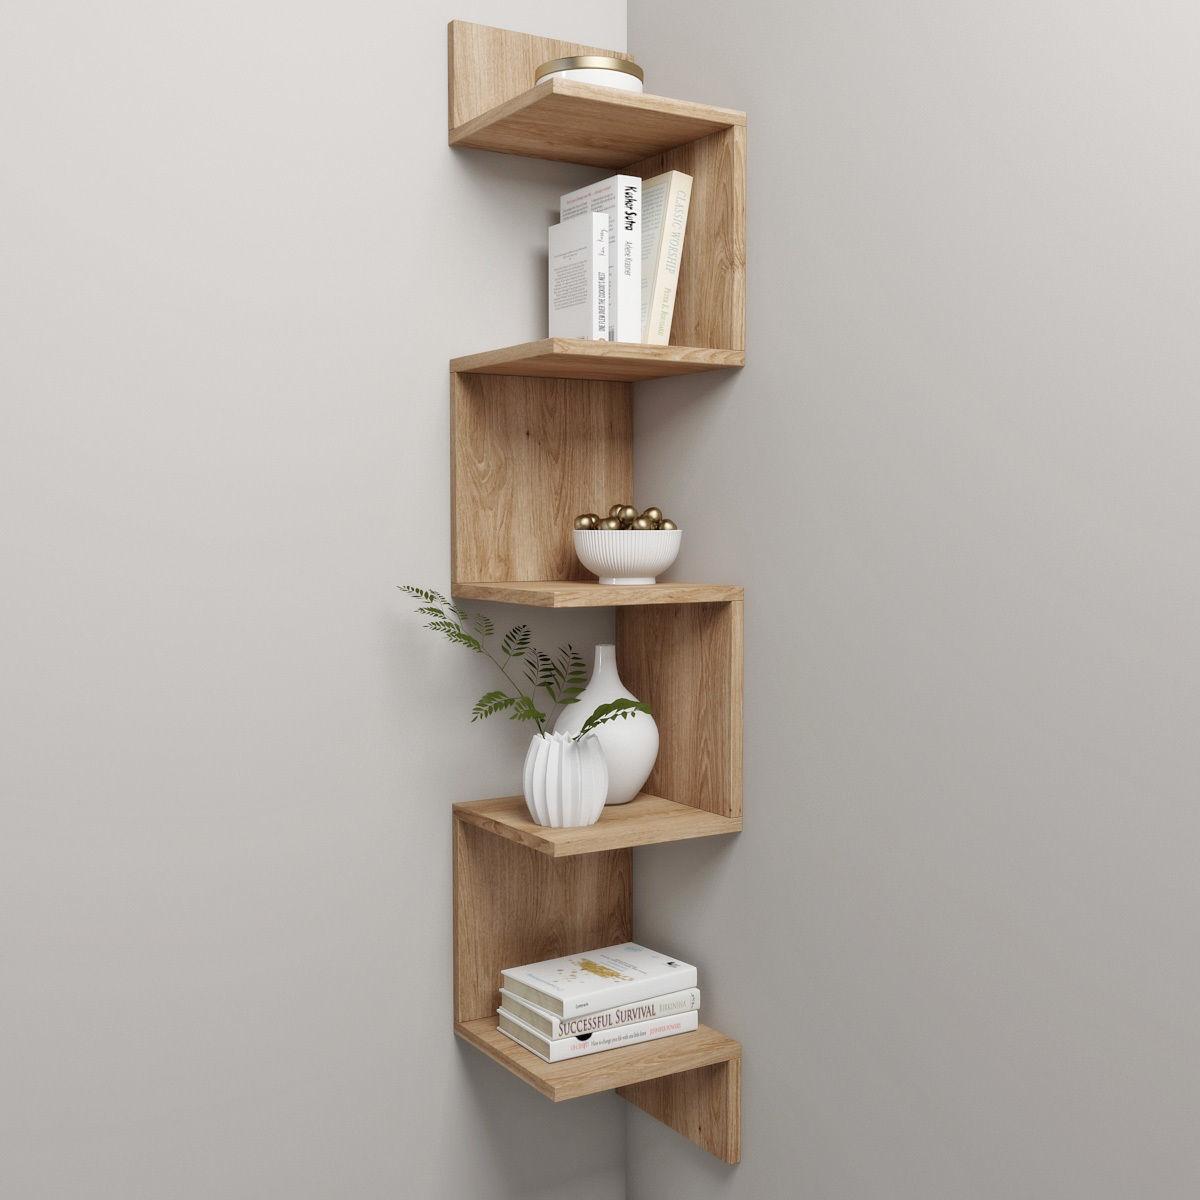 Corner shelf and decor 3D model max fbx 1 ... VNXIRFH